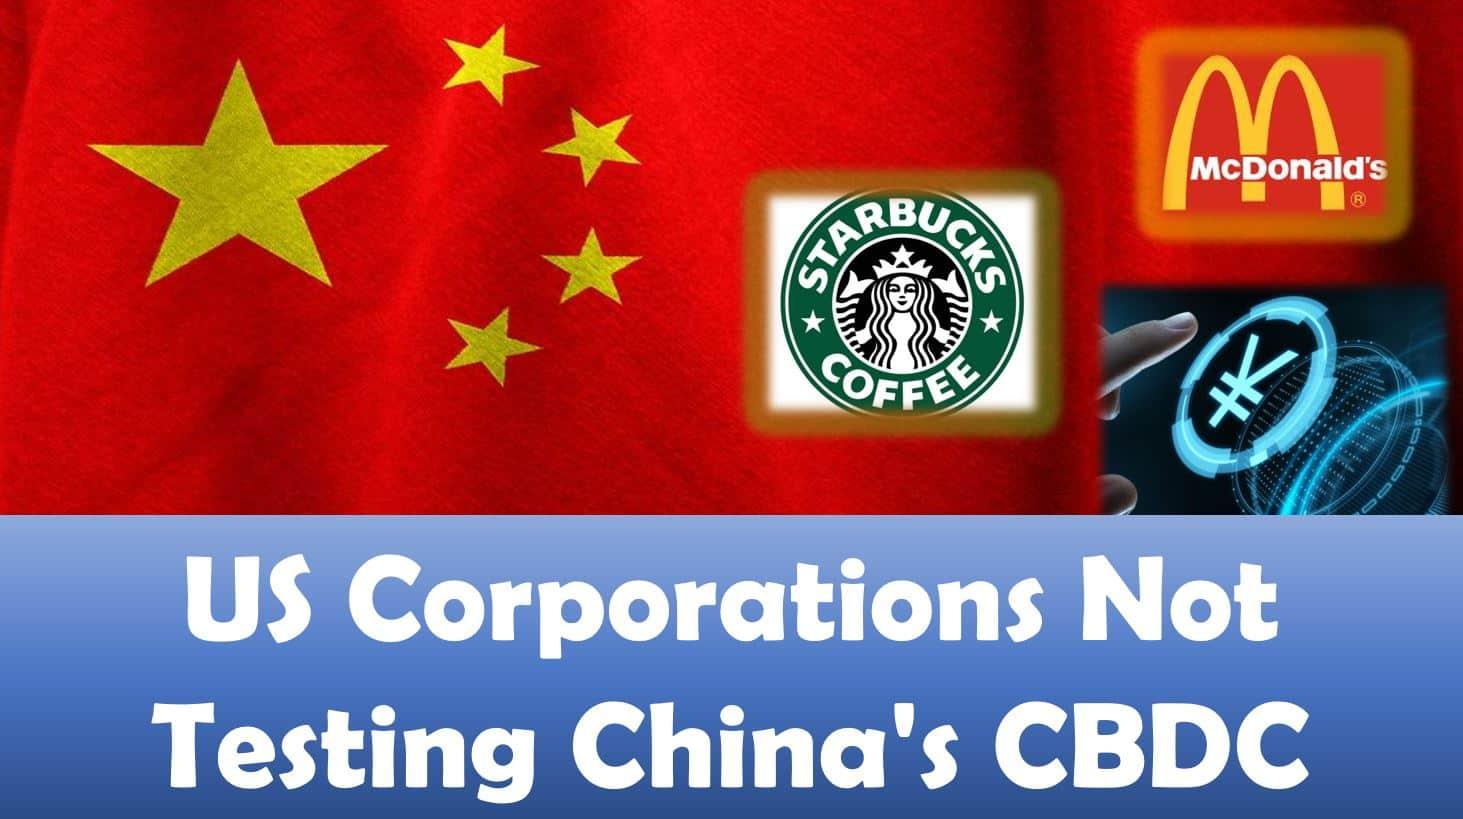 US Corporations Not Testing China's CBDC